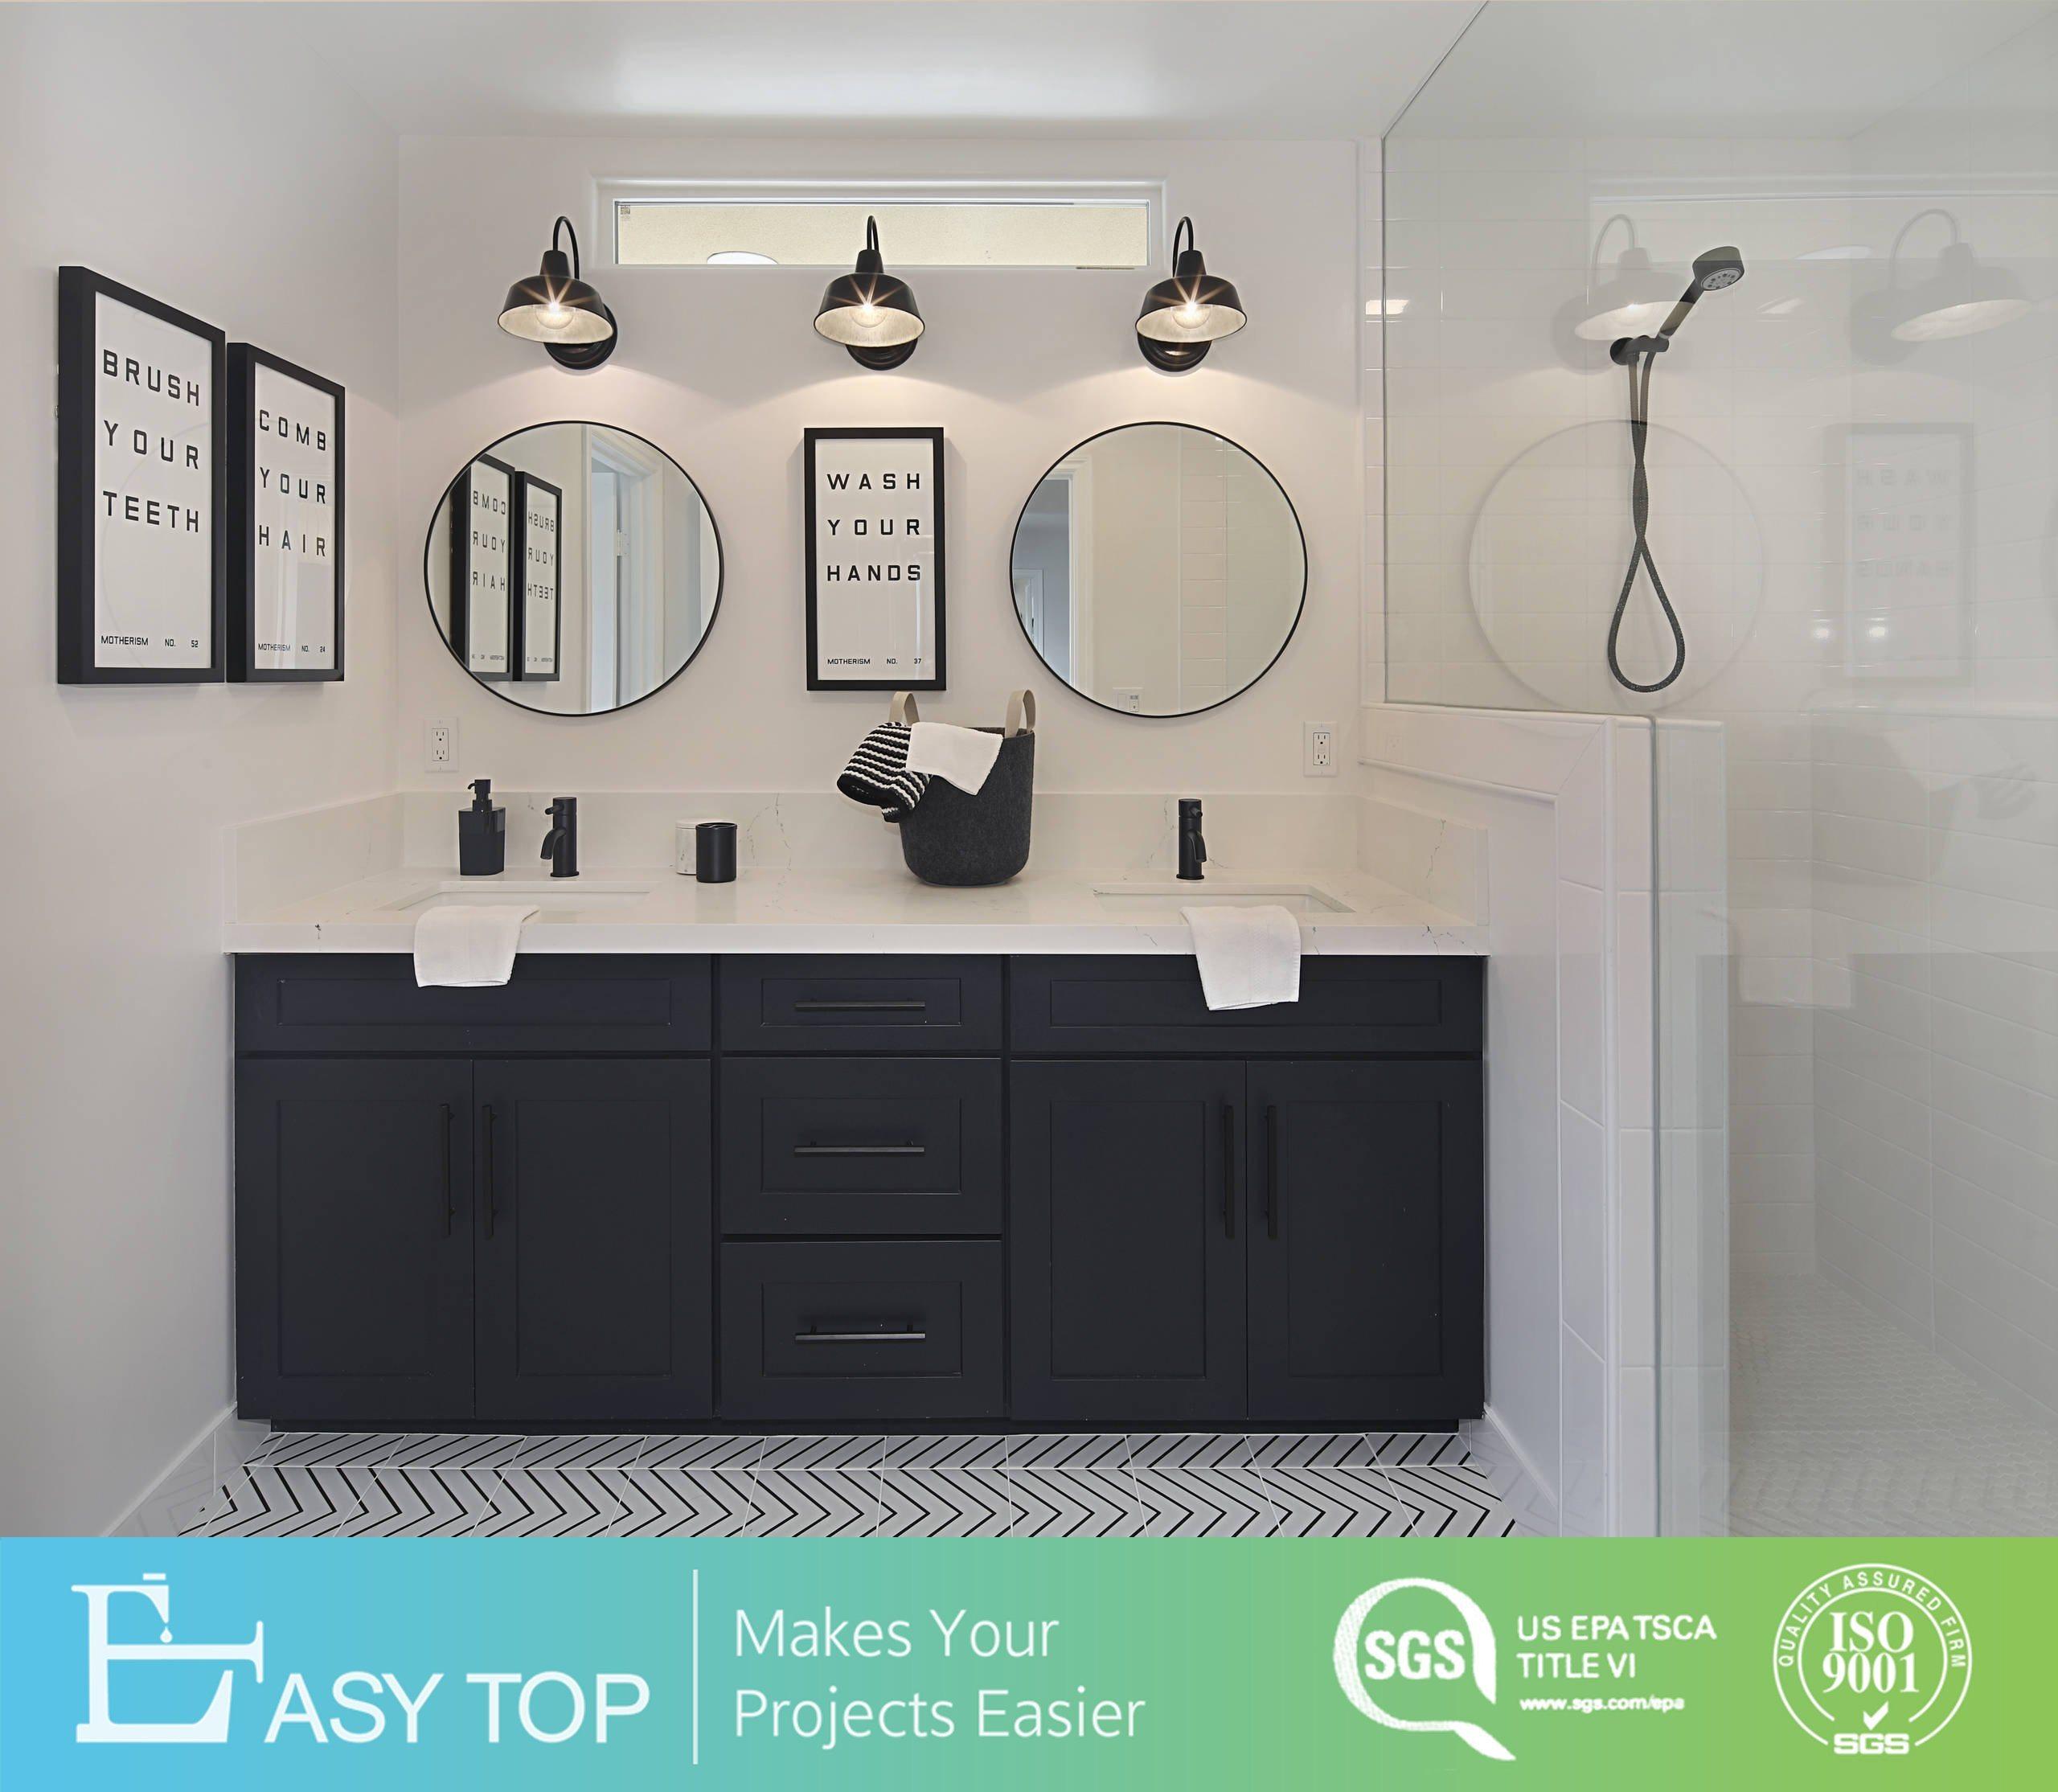 Modern Double Sink Bathroom Vanity Floor Mounted Black Pvc Shaker Door Bathroom Cabinets China Bathroom Vanity Philippines Bathroom Cabinet Philippines Basin Made In China Com